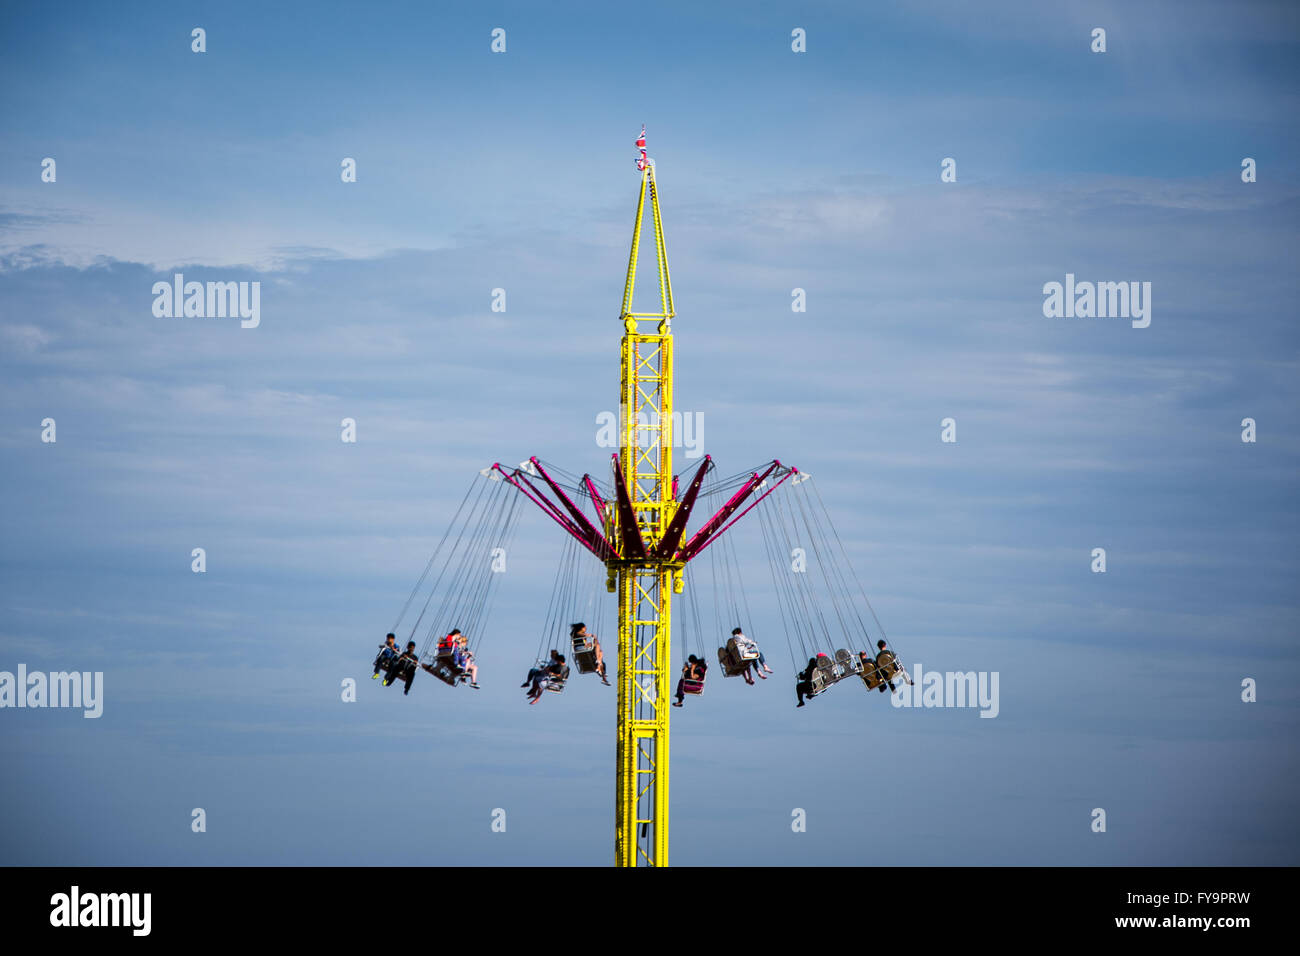 Amusement park ride in Clacton-on-Sea, Essex, England - Stock Image